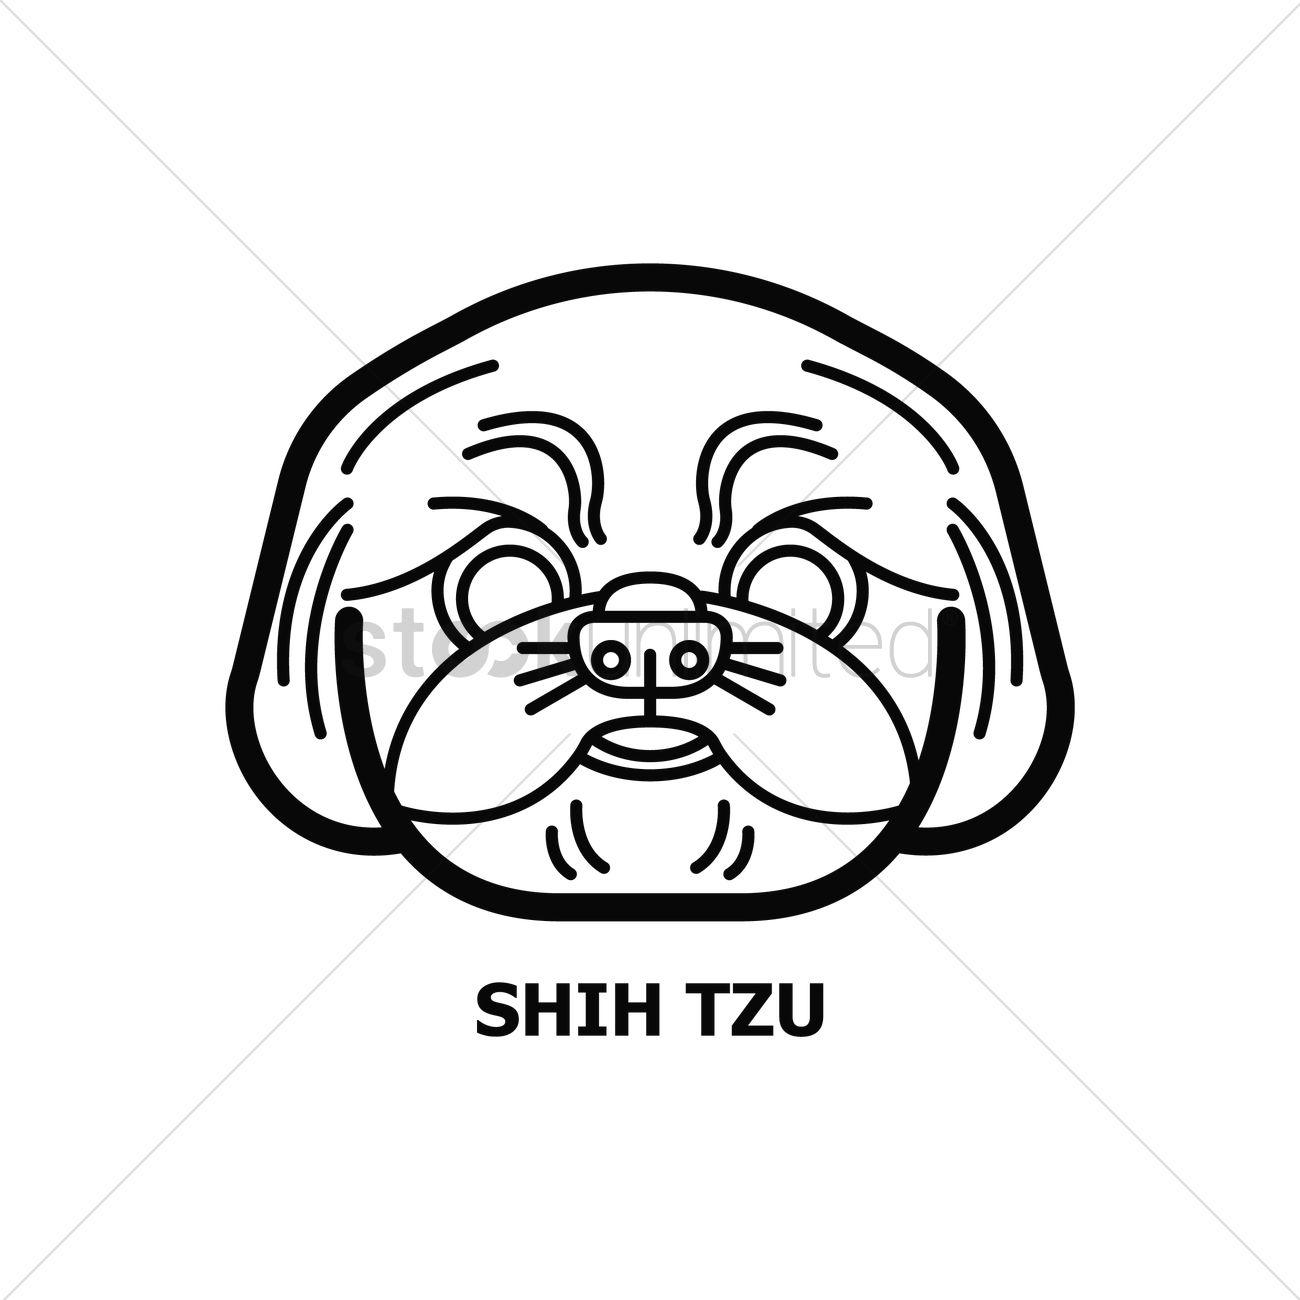 Shih Tzu Dog Vector Image